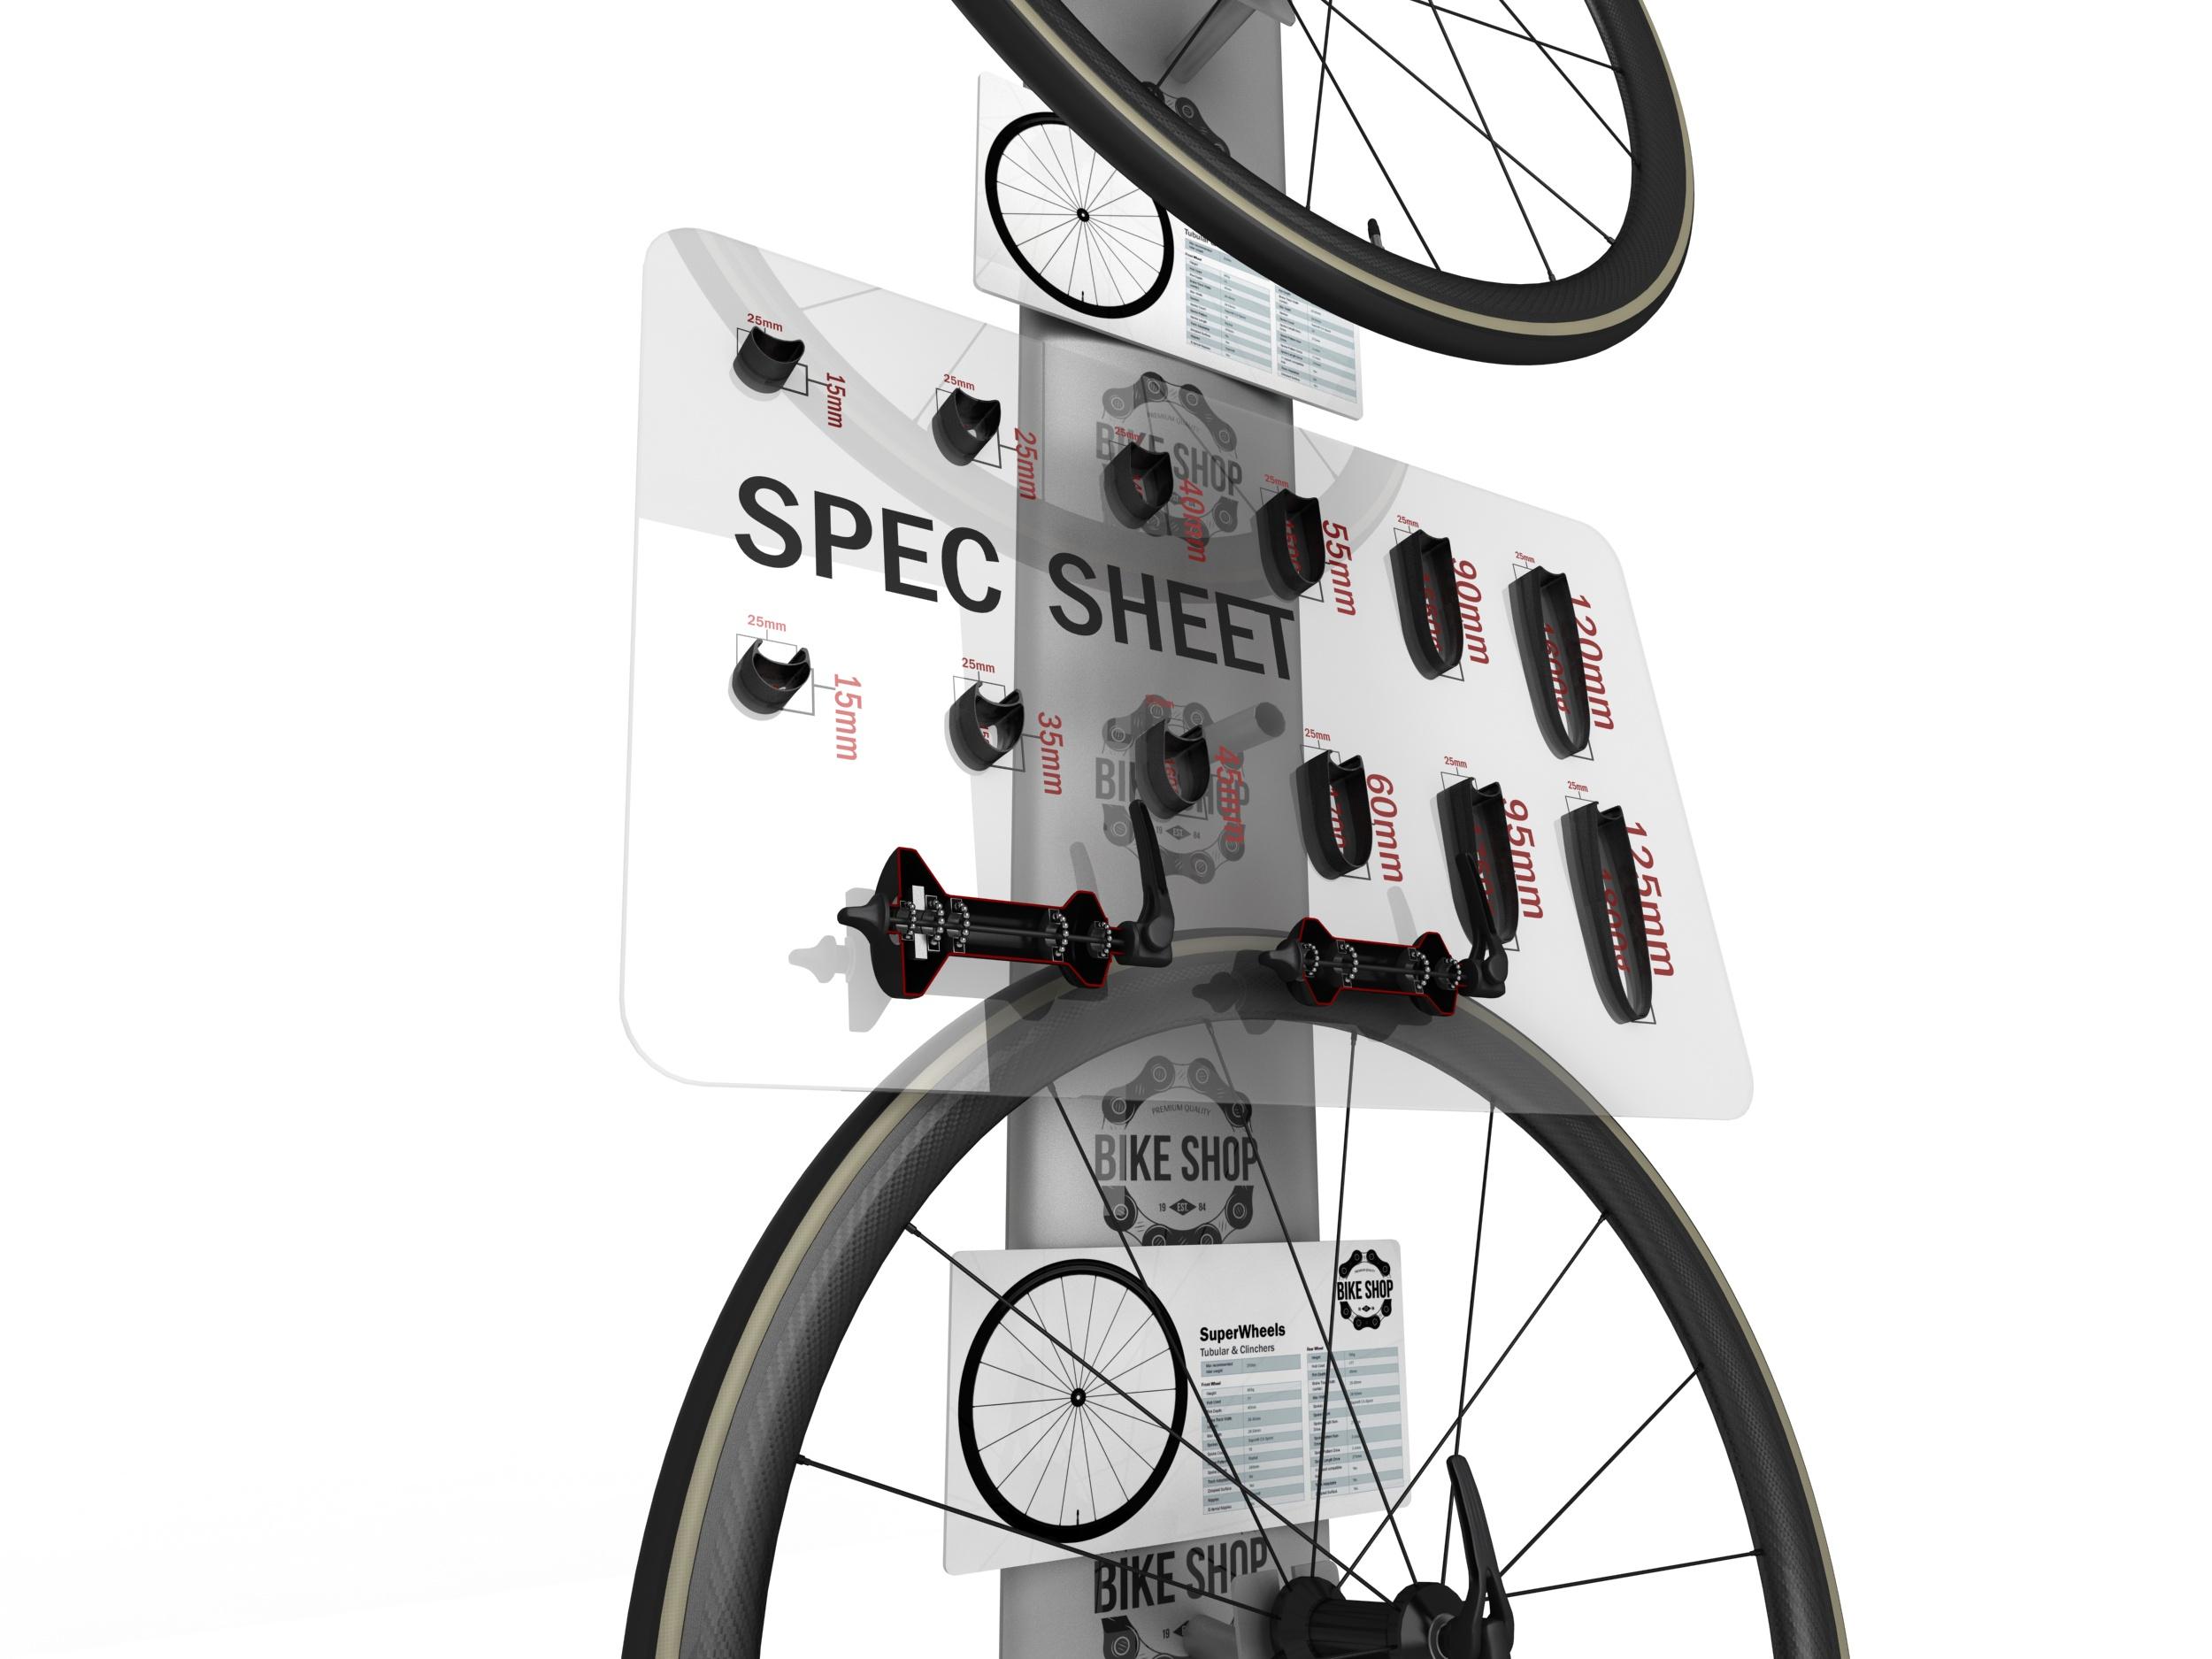 POS_Road Wheel Stand_001.jpg